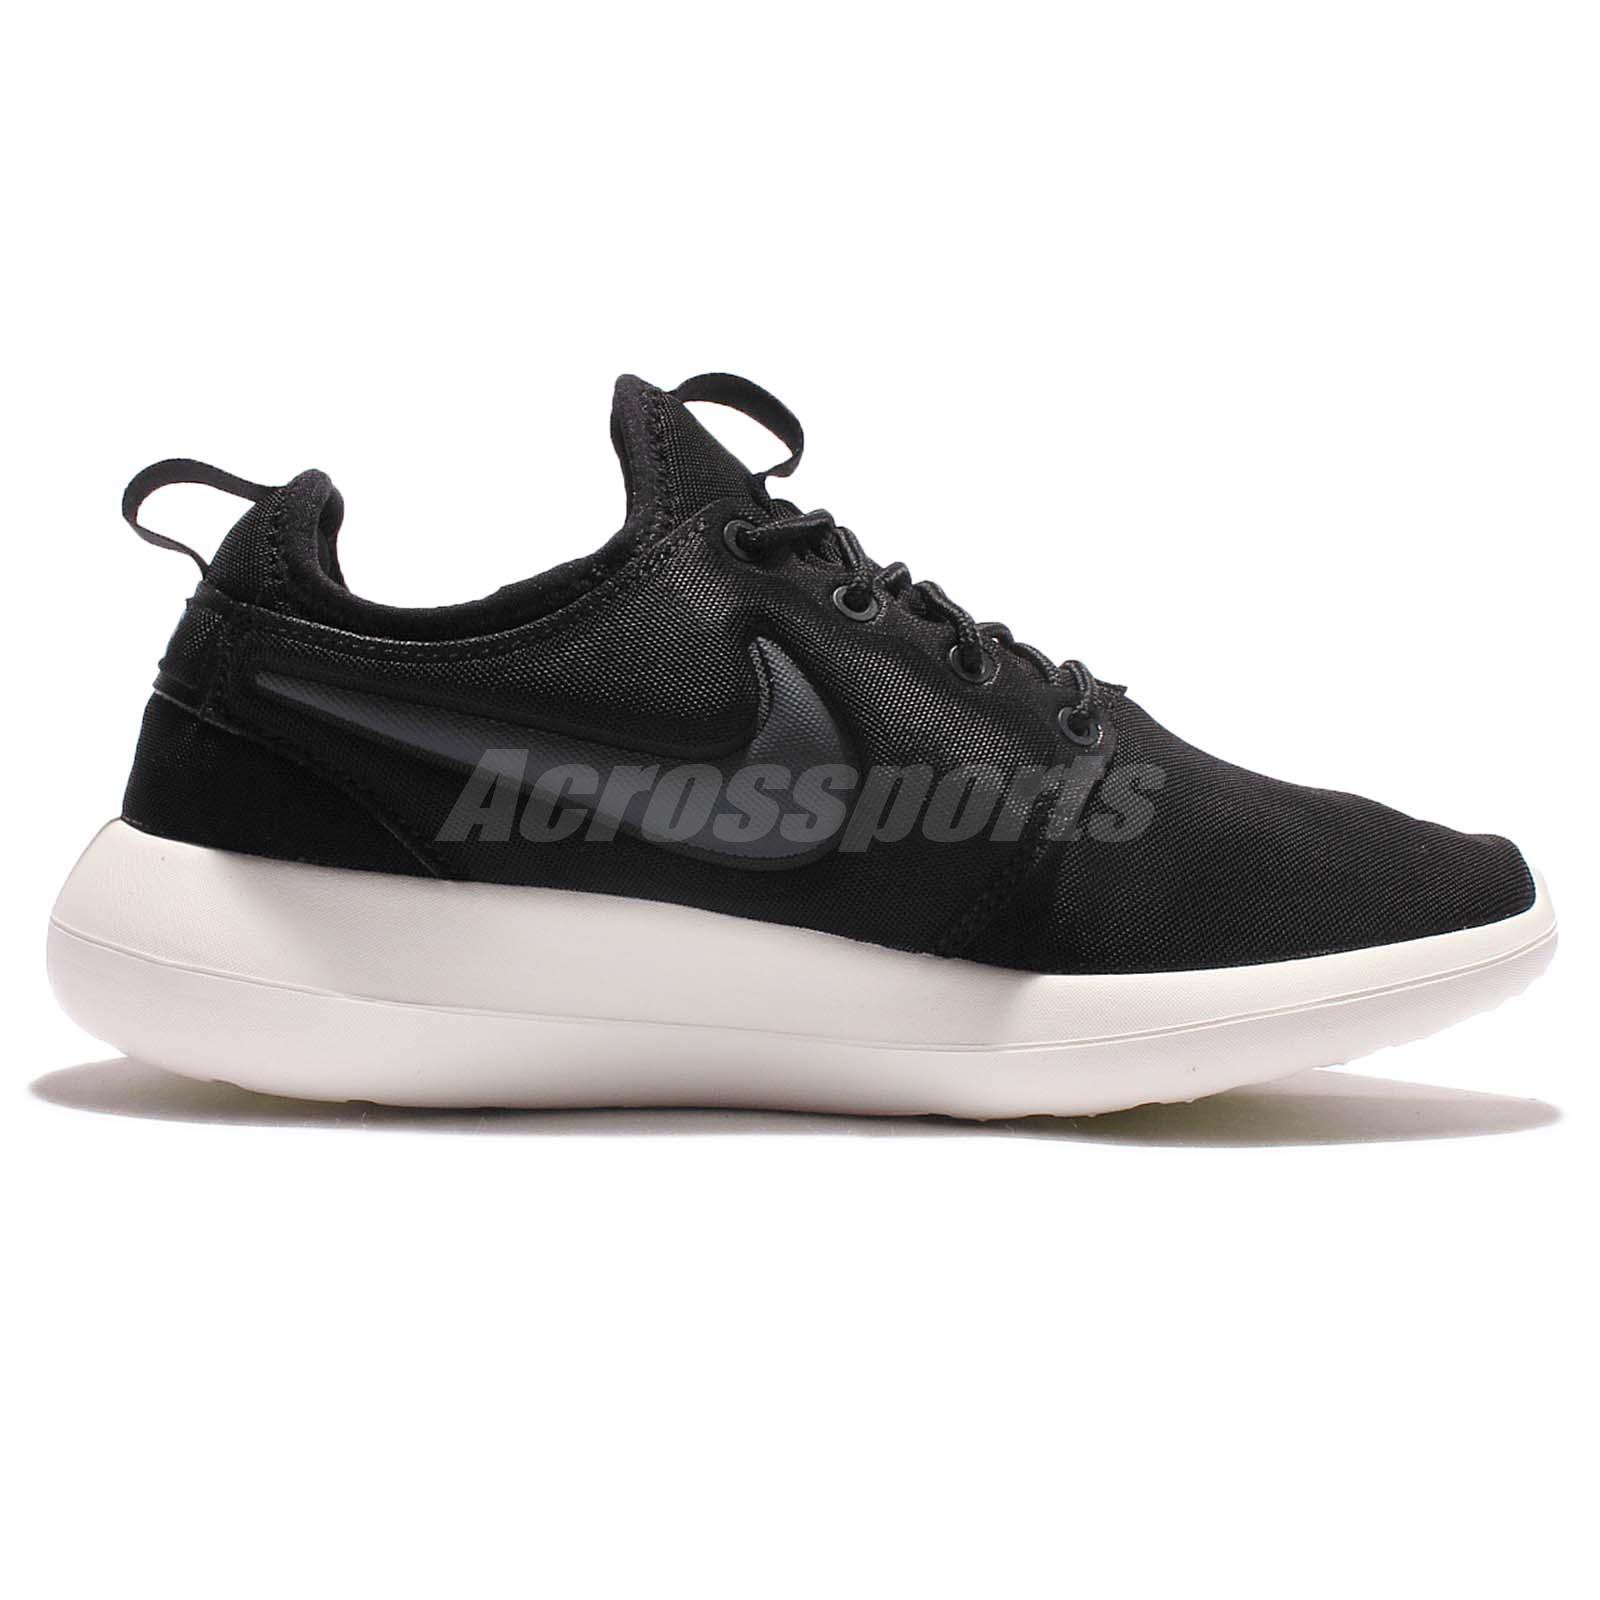 Nike Roshe Two 2 Rosherun Black Sail Mens Running Shoes Sneakers